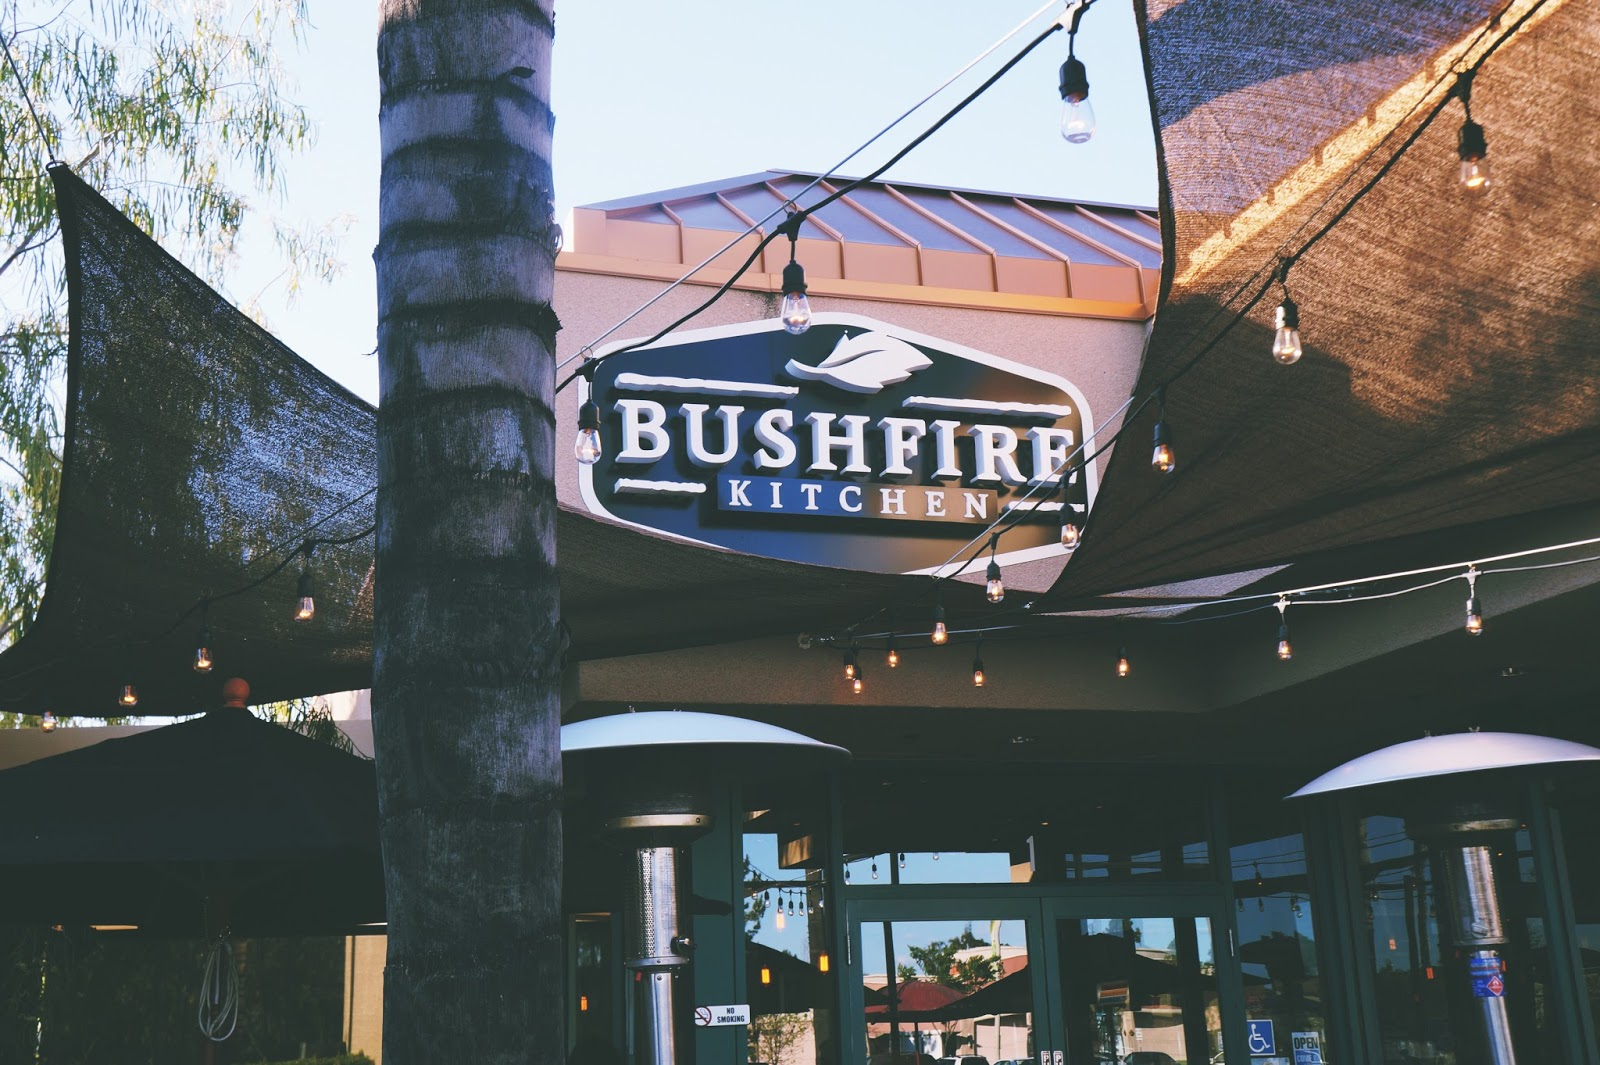 bushfire kitchen, bushfire temecula, temecula